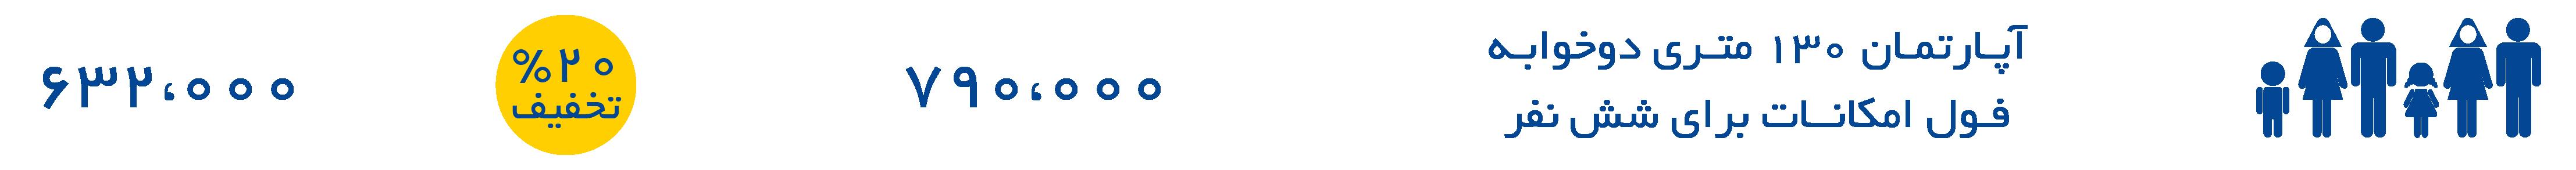 06-person-saran